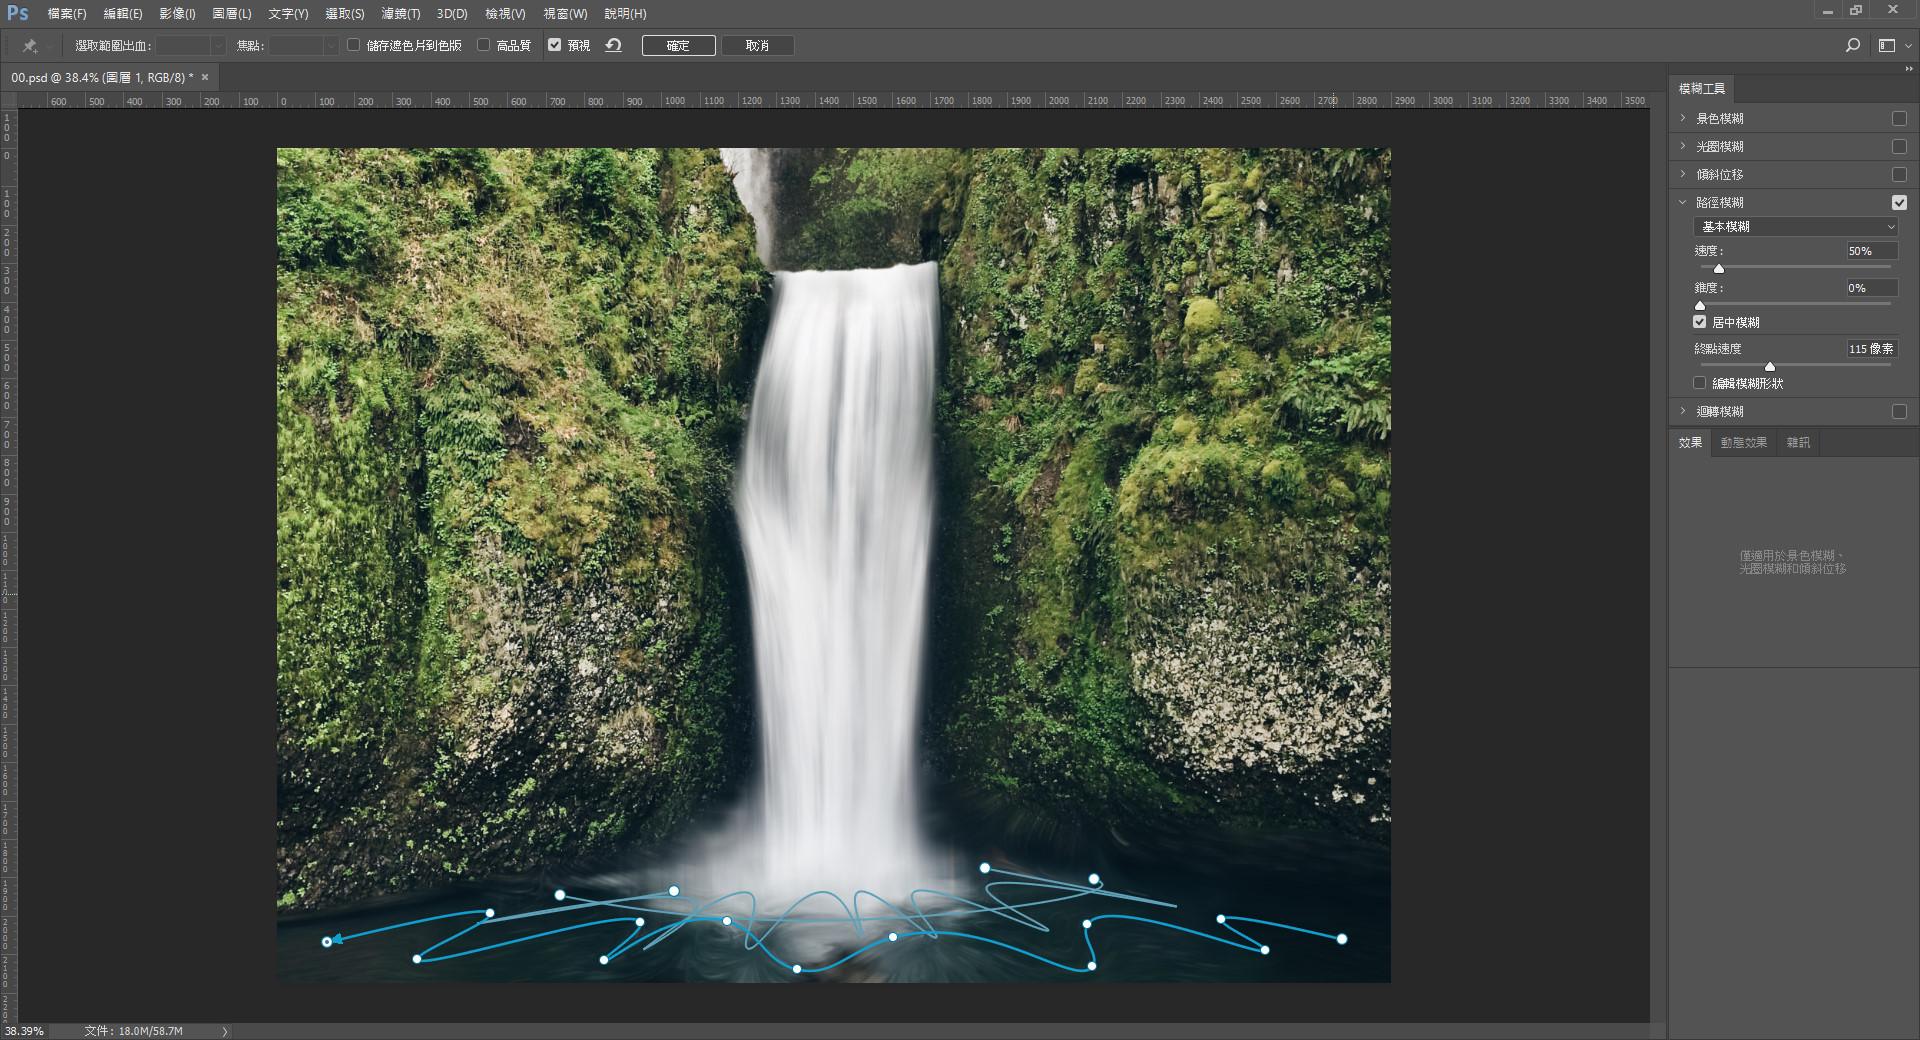 Photoshop - Path Blur Tool (17)